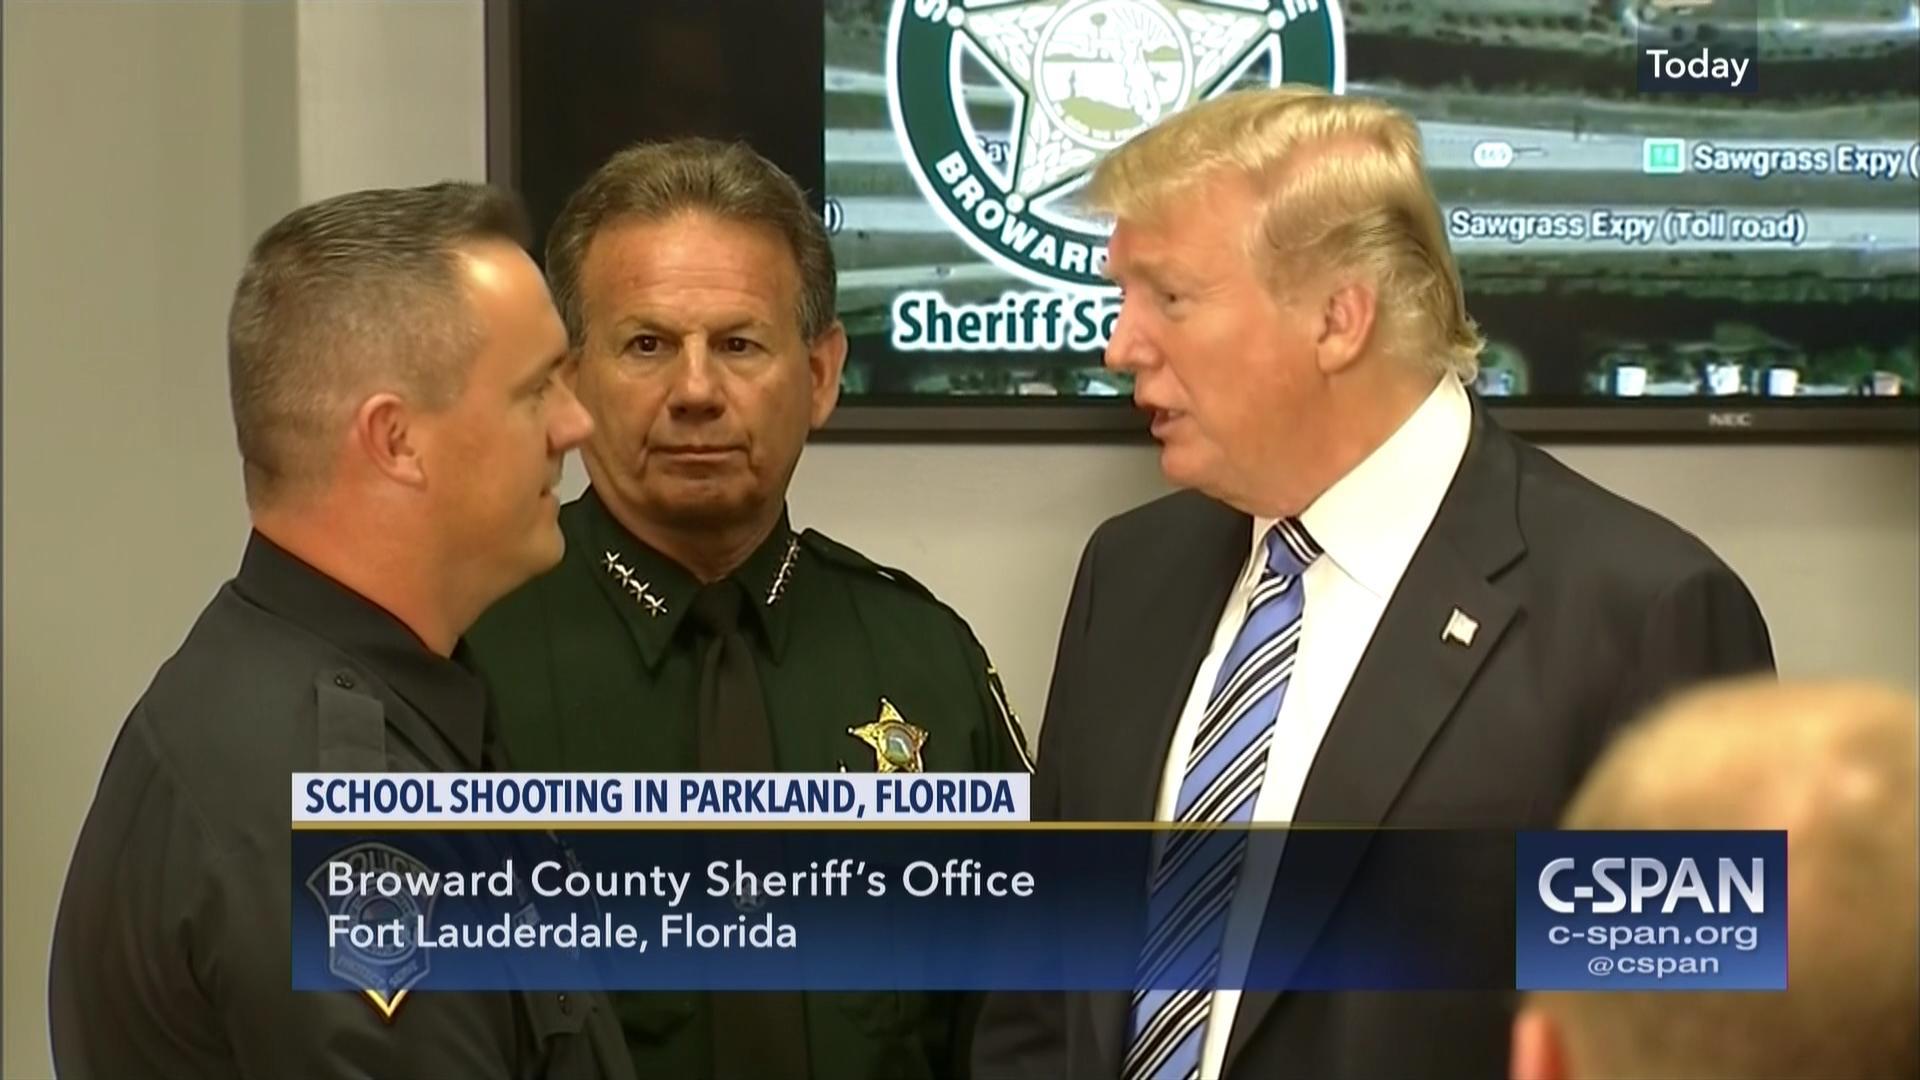 President Trump Visits Broward County Sheriff's Office